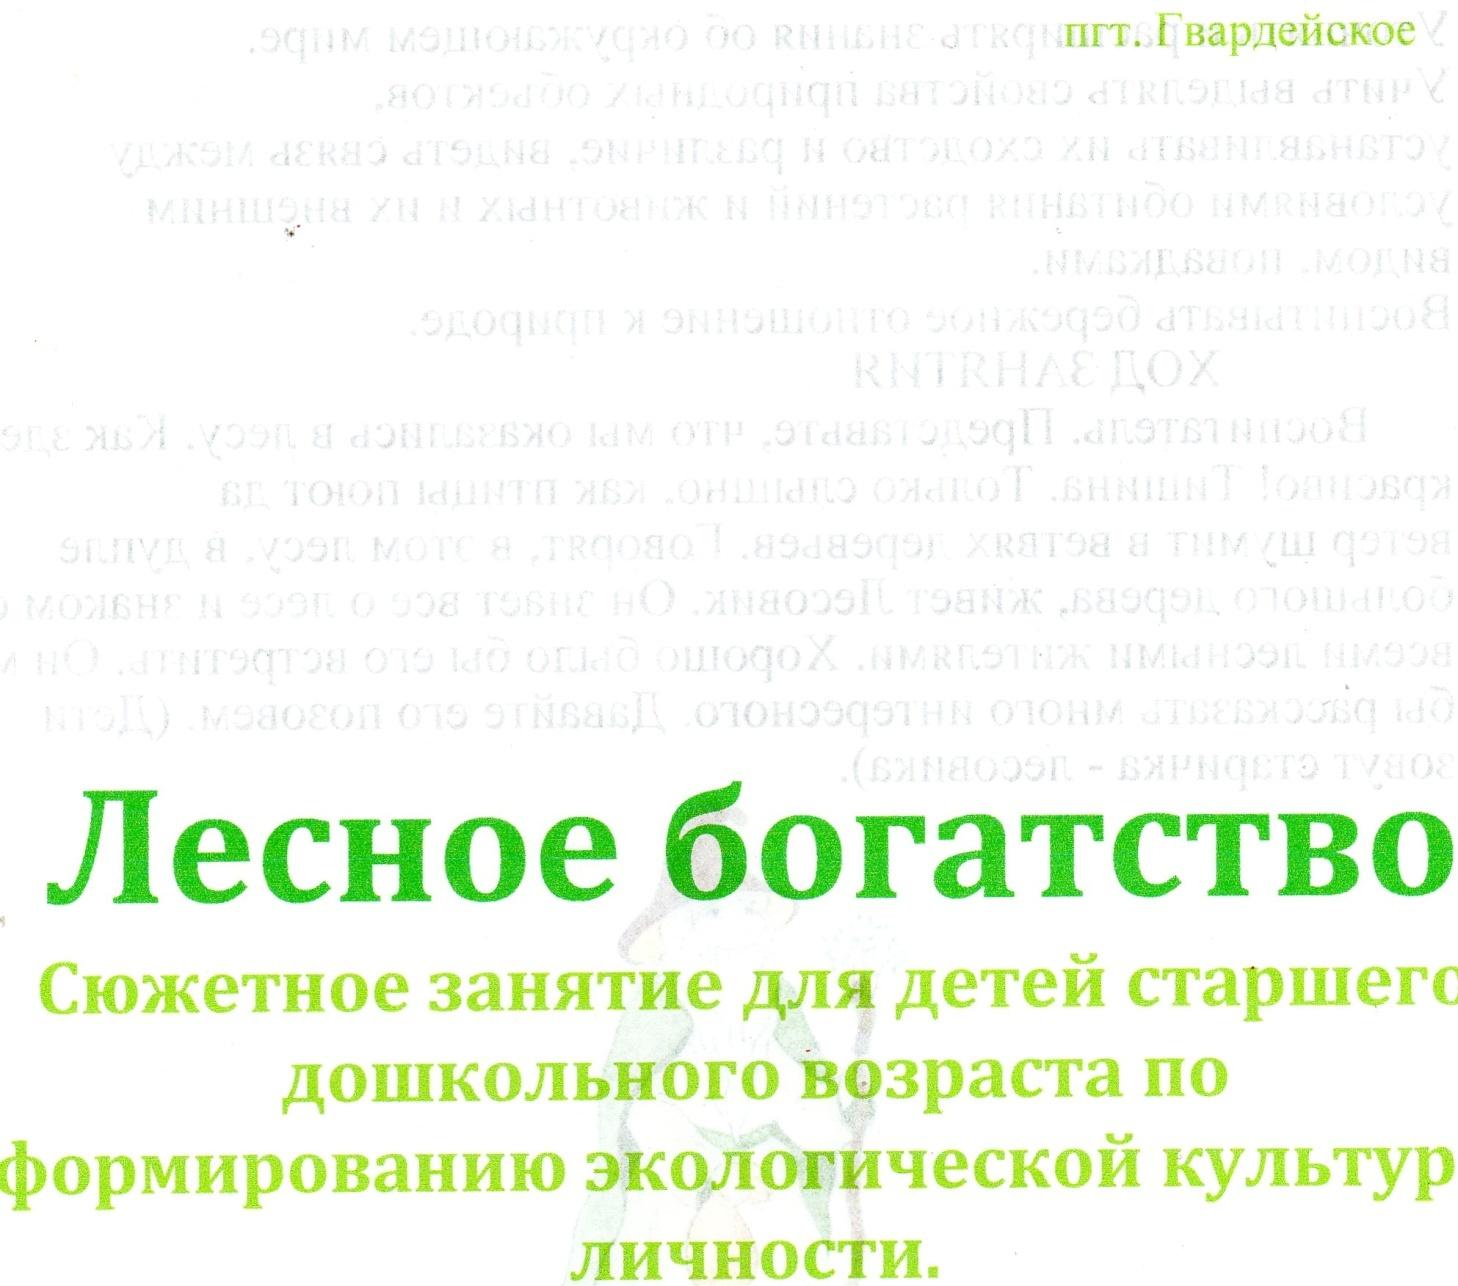 C:\Users\Александр\Pictures\img023.jpg